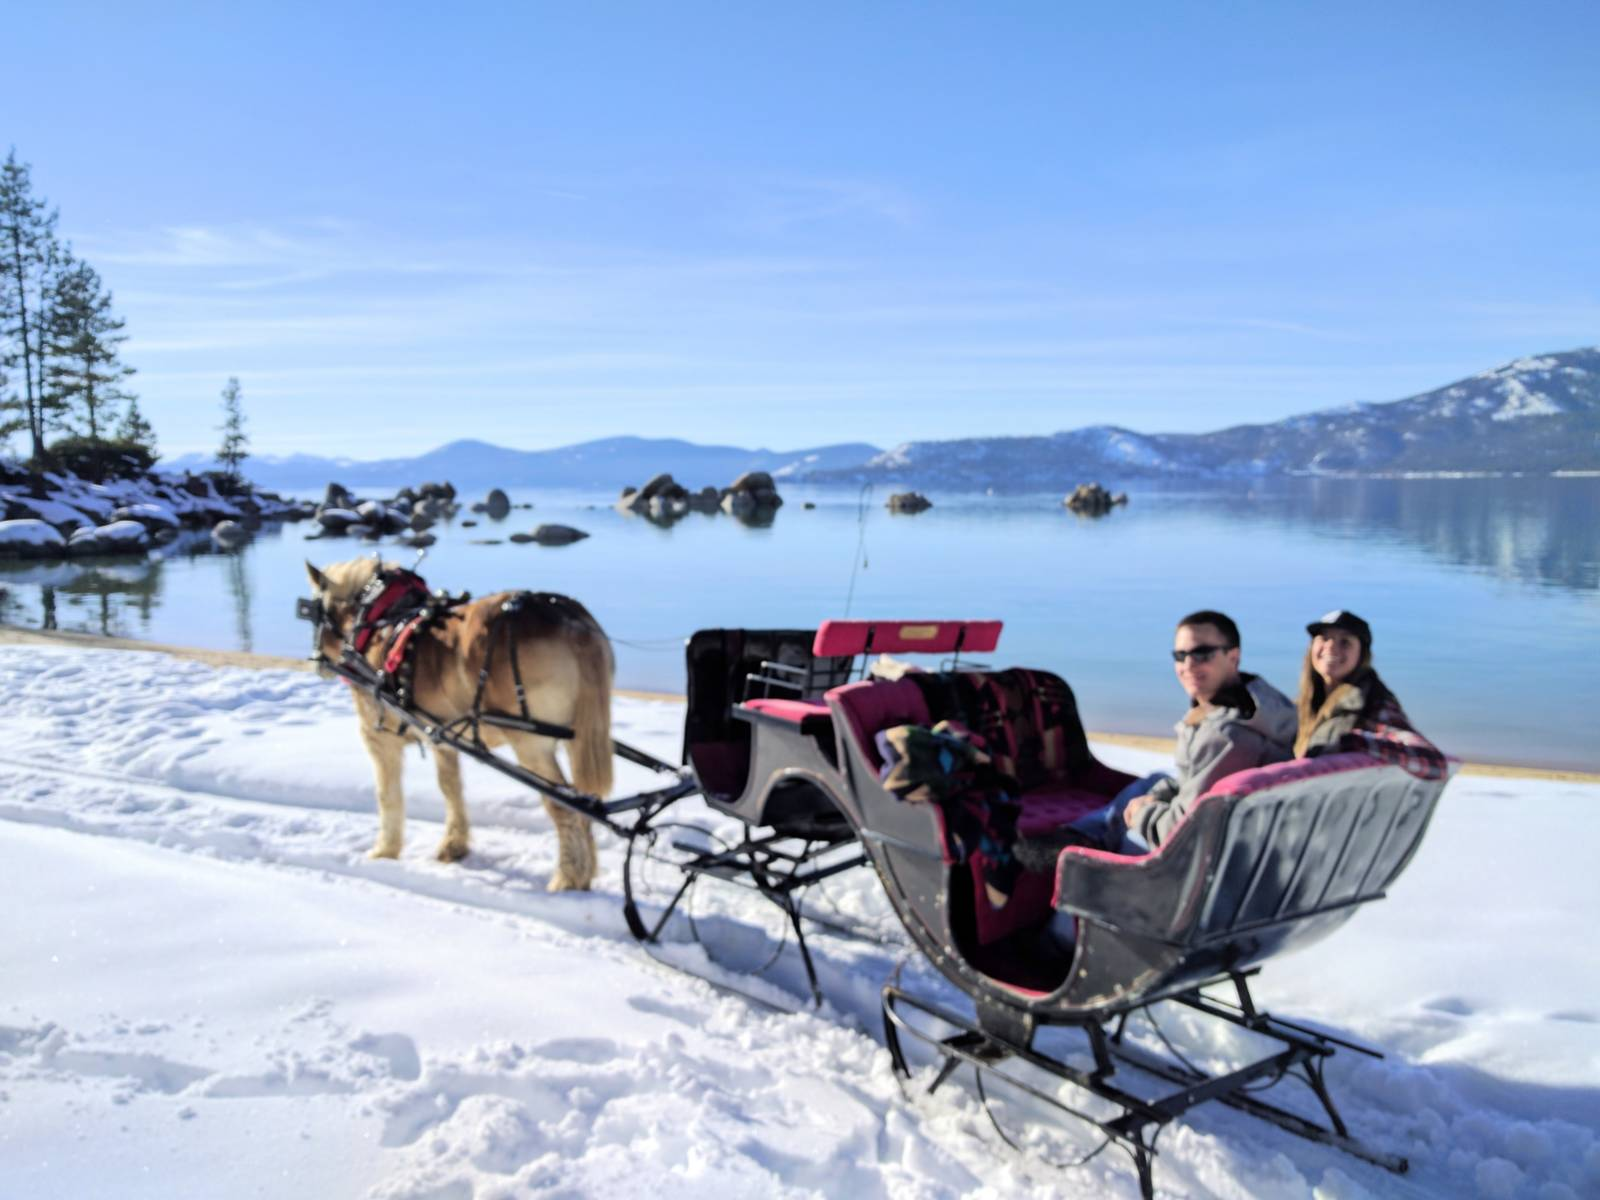 blkred santa sleigh snow.jpg